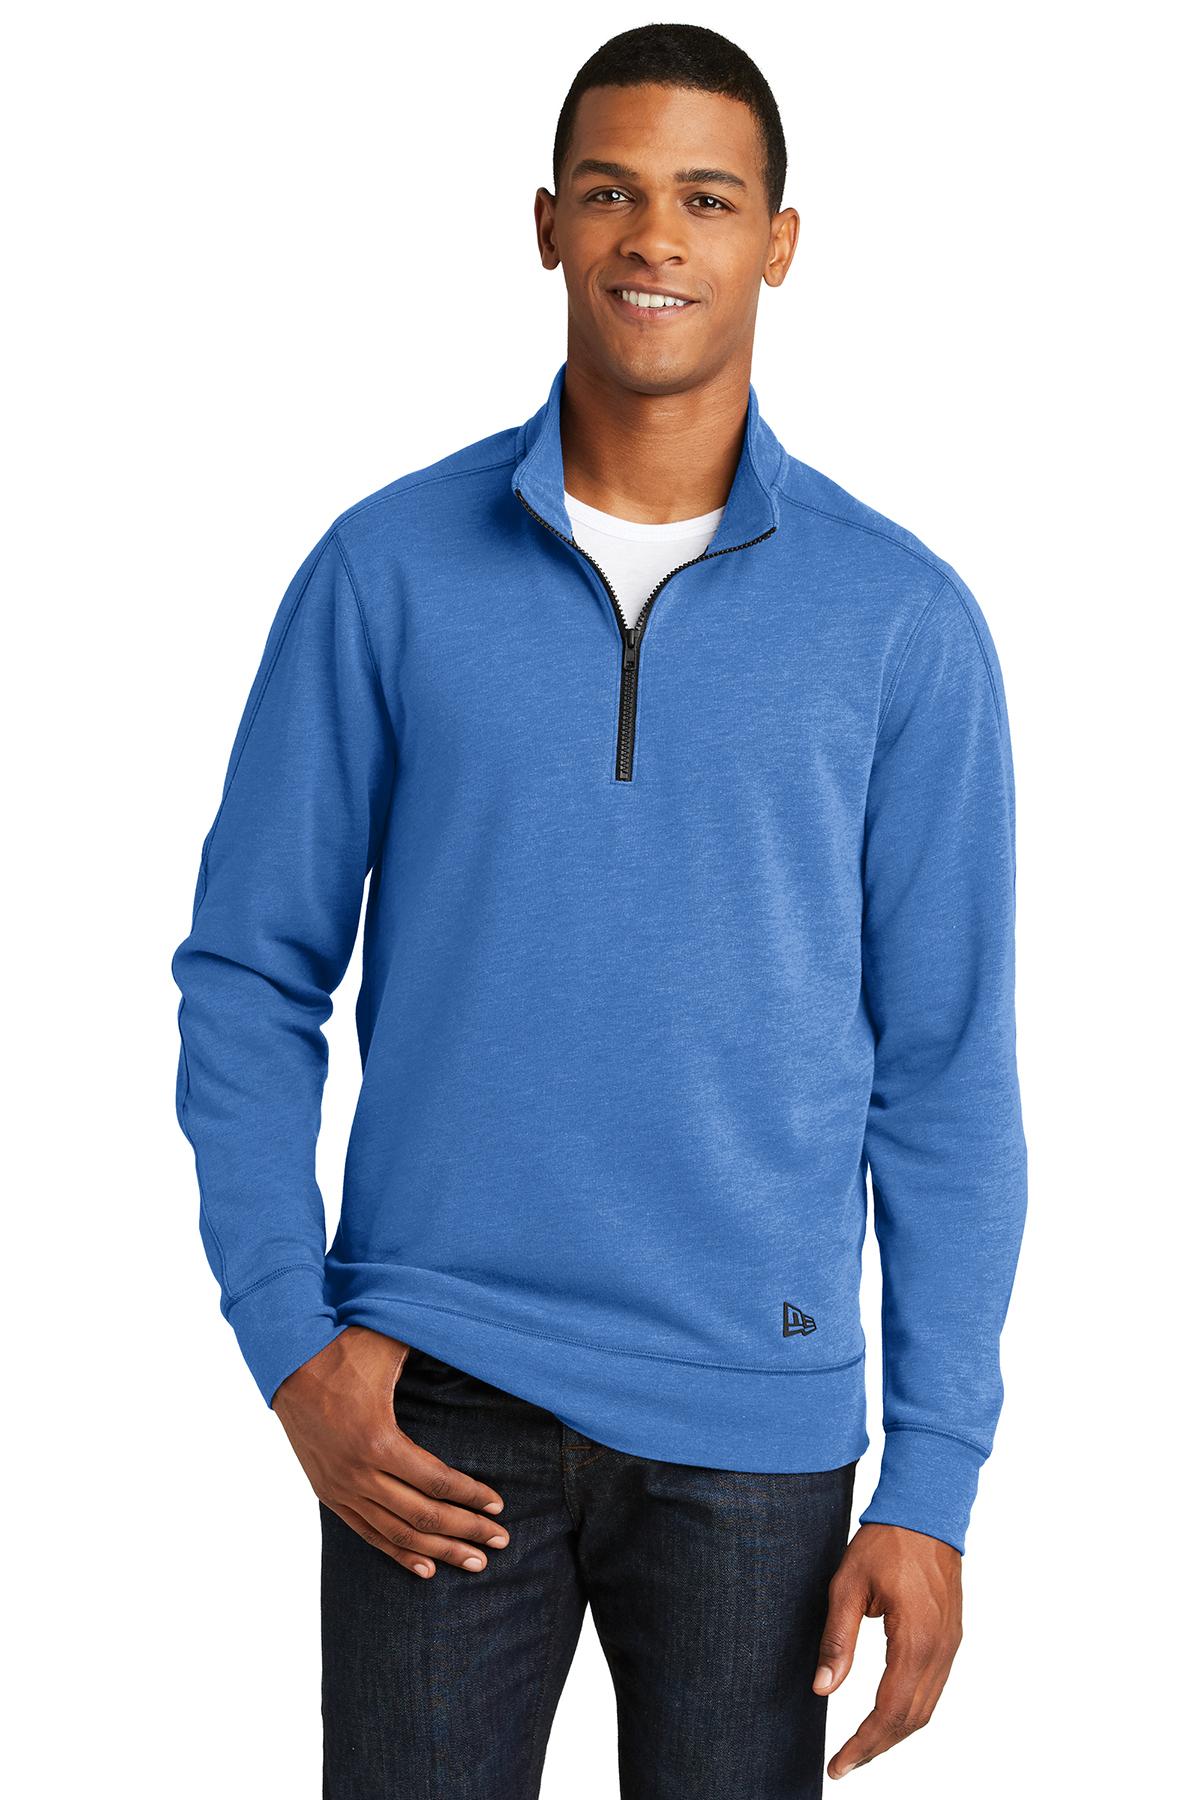 New Era NEA512 - Men's Tri-Blend Fleece 1/4 Zip Pullover